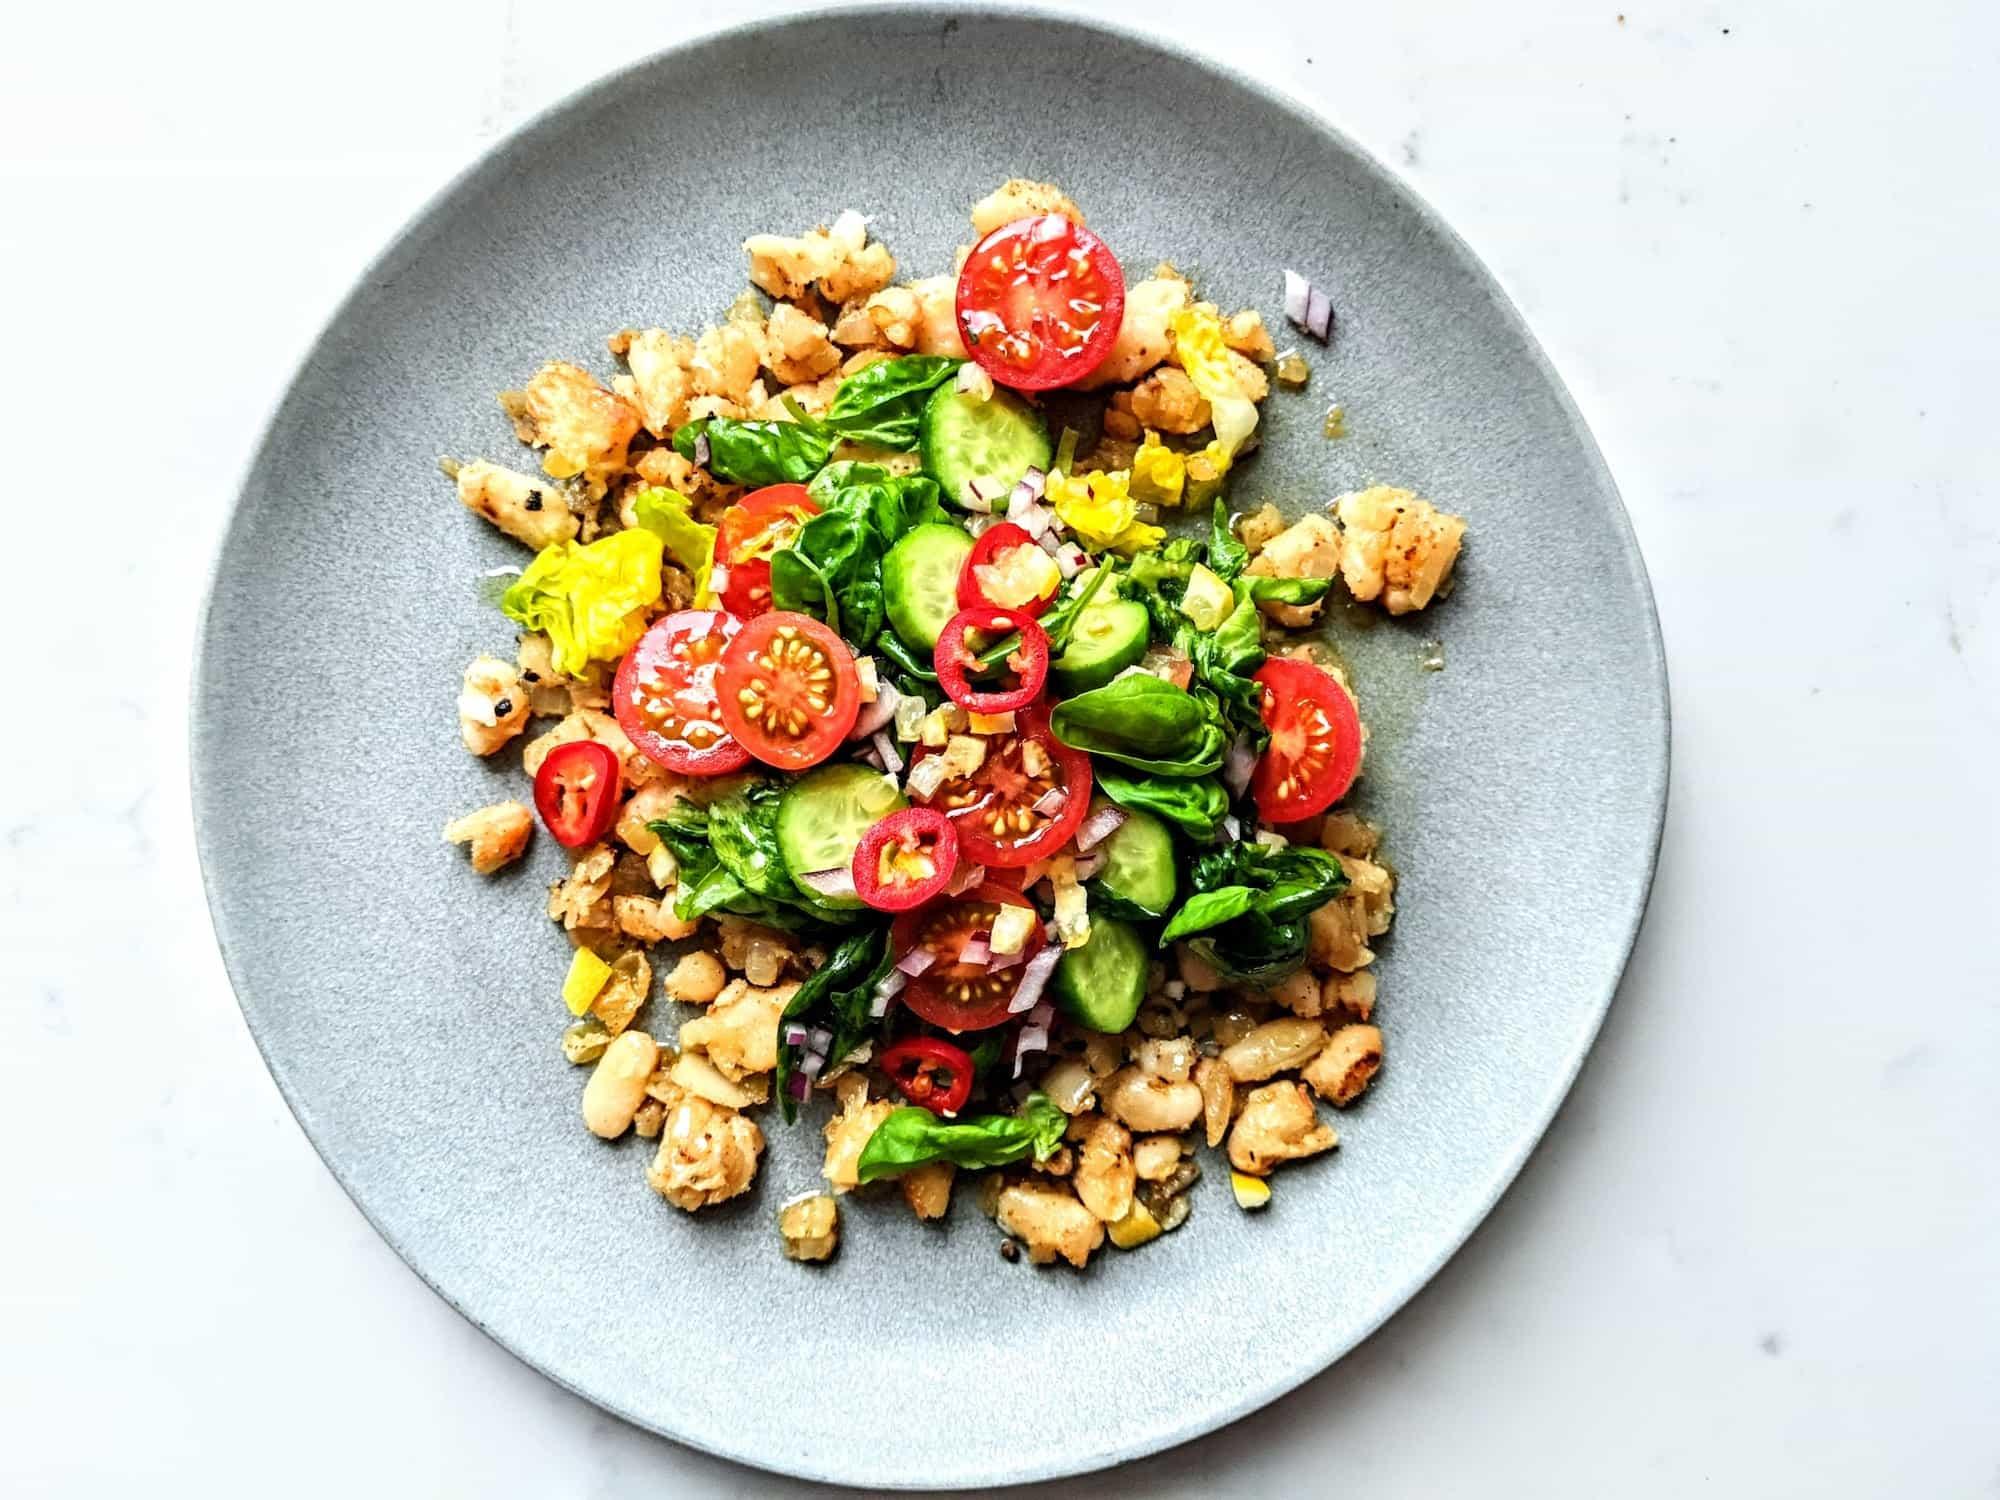 Refried Bean Salad